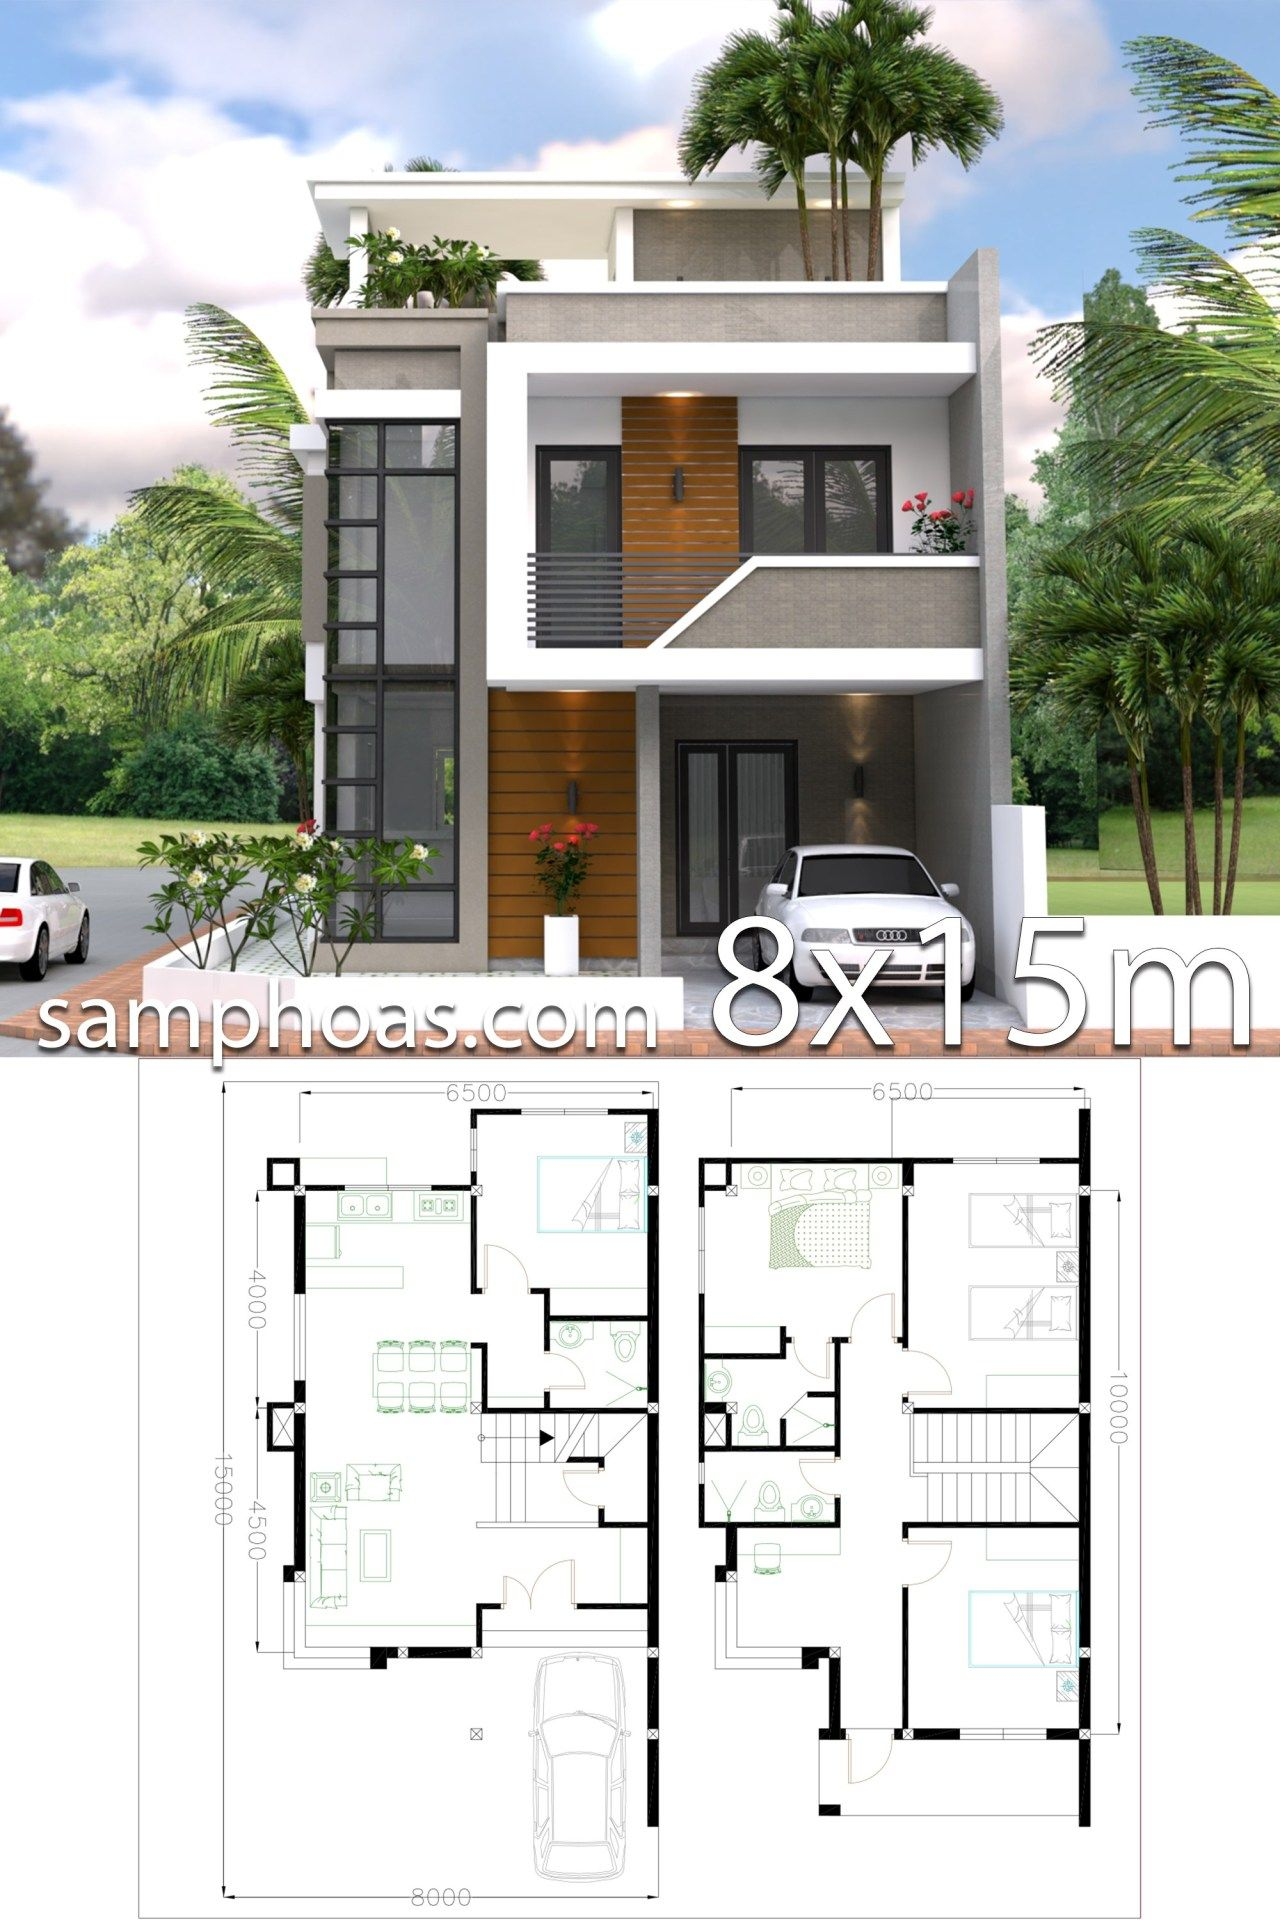 Home Design Plan 8x15m With 4 Bedrooms Samphoas Plan House Construction Plan House Architecture Design Duplex House Plans